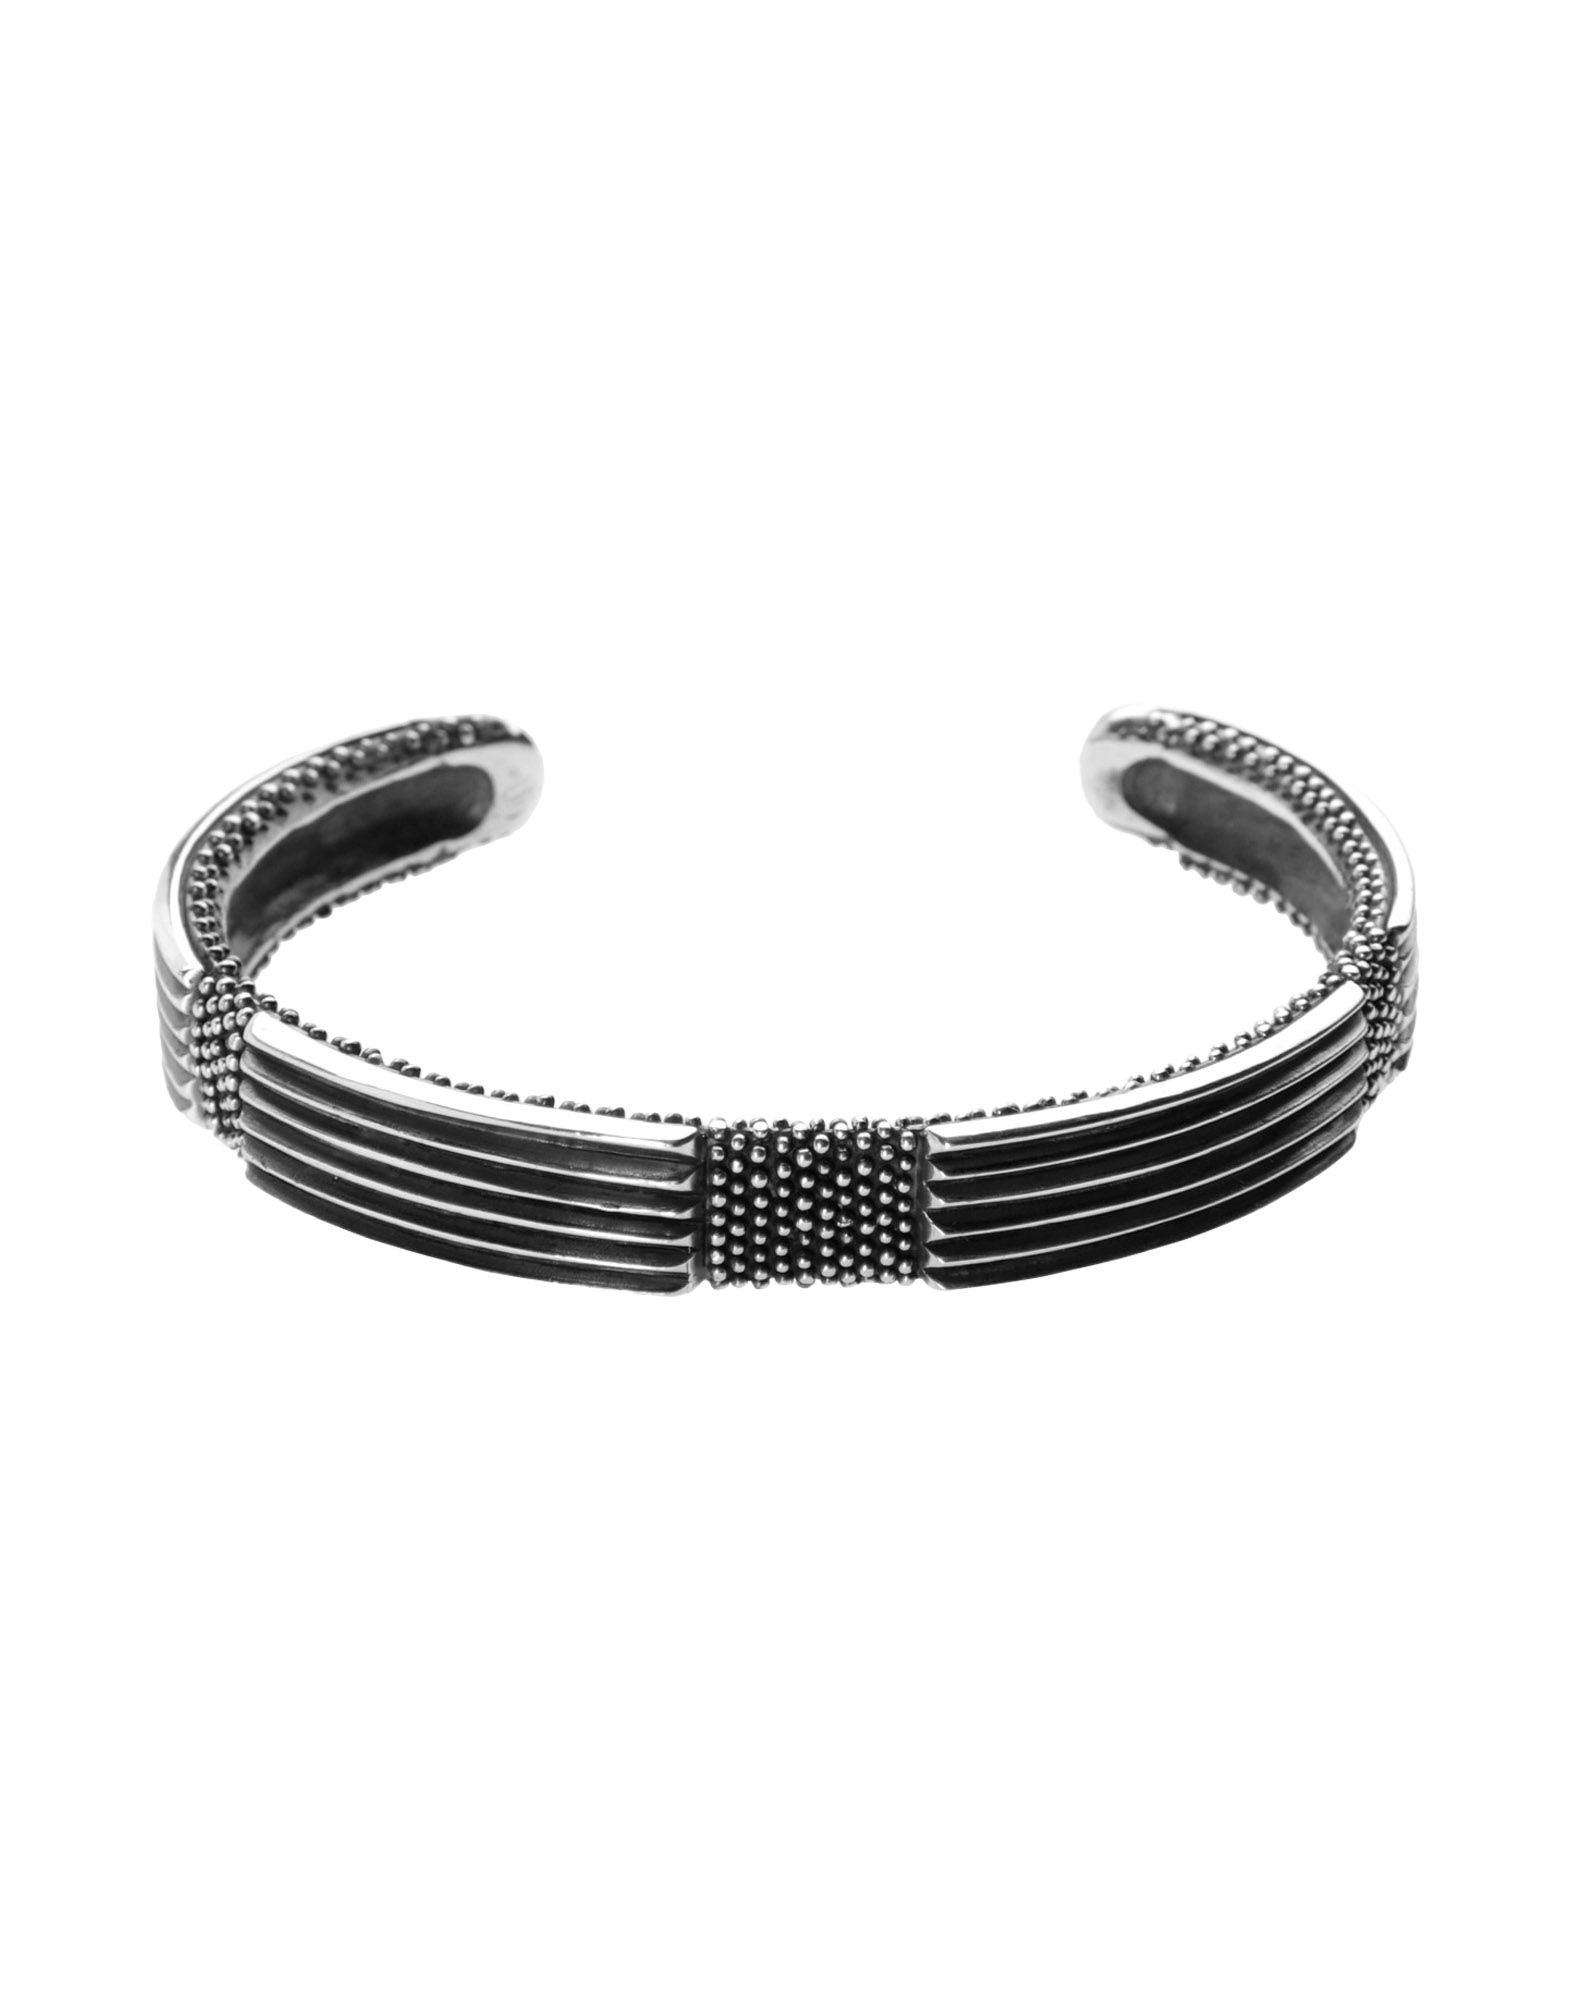 MANUEL BOZZI Bracelet in Silver